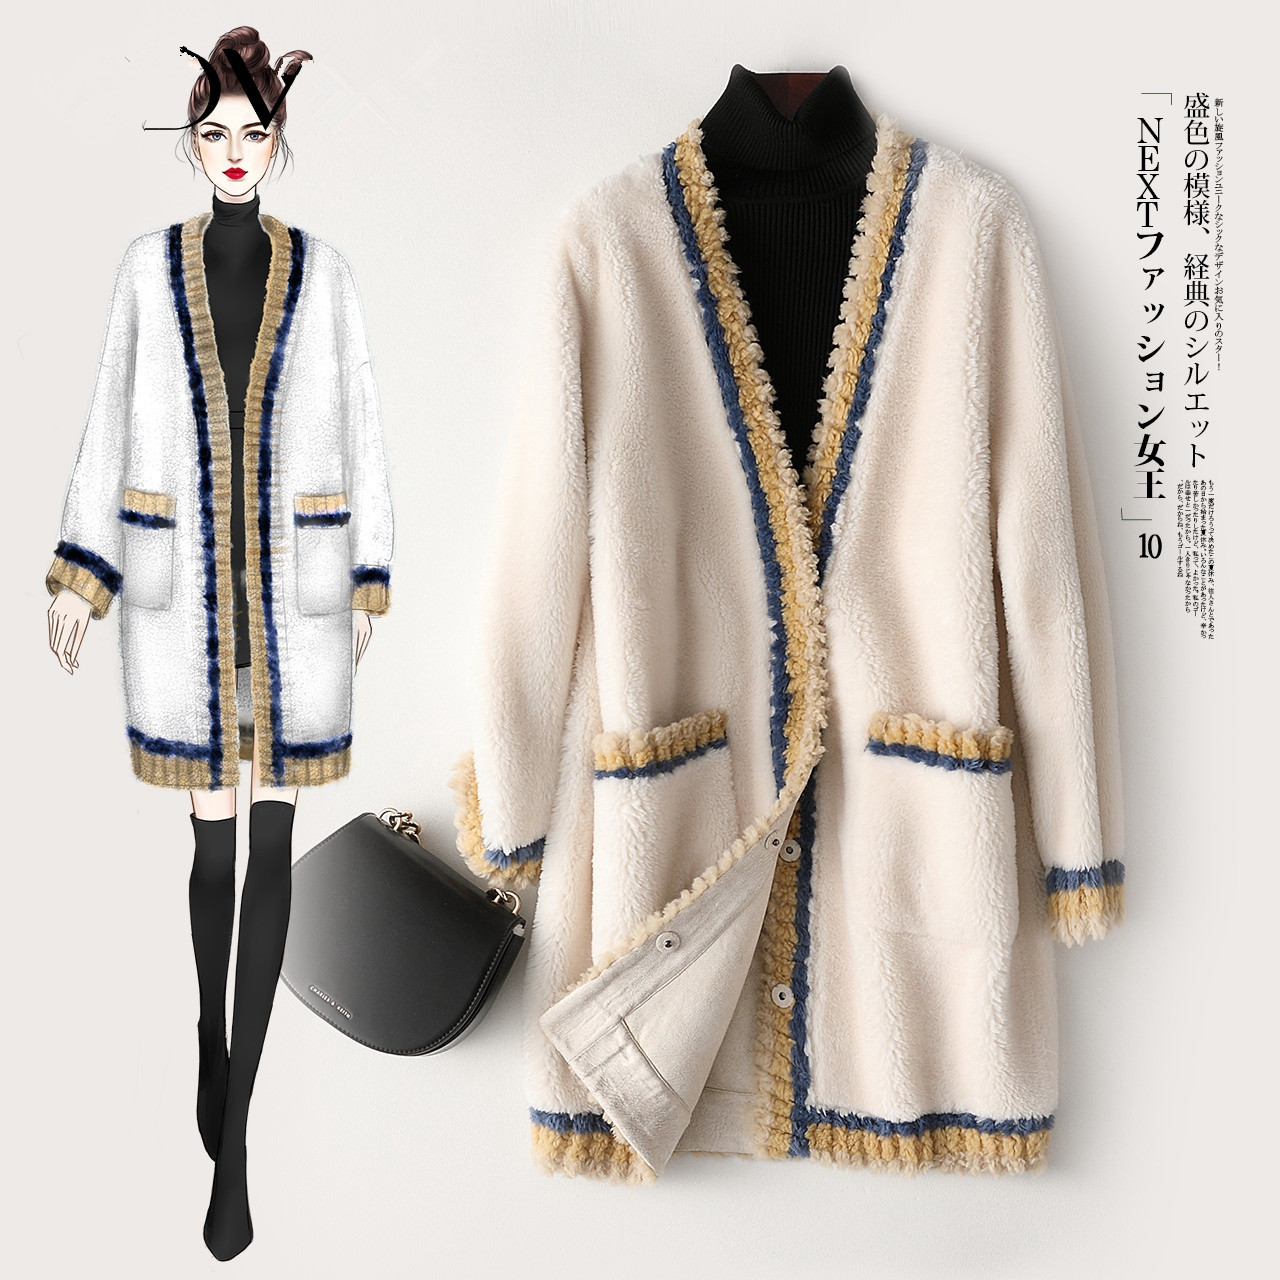 Coat Fur Real Winter Jacket Women Clothes 2020 Sheep Shearling Wool Coat Female Jacket Korean Outwear Manteau Femme MY